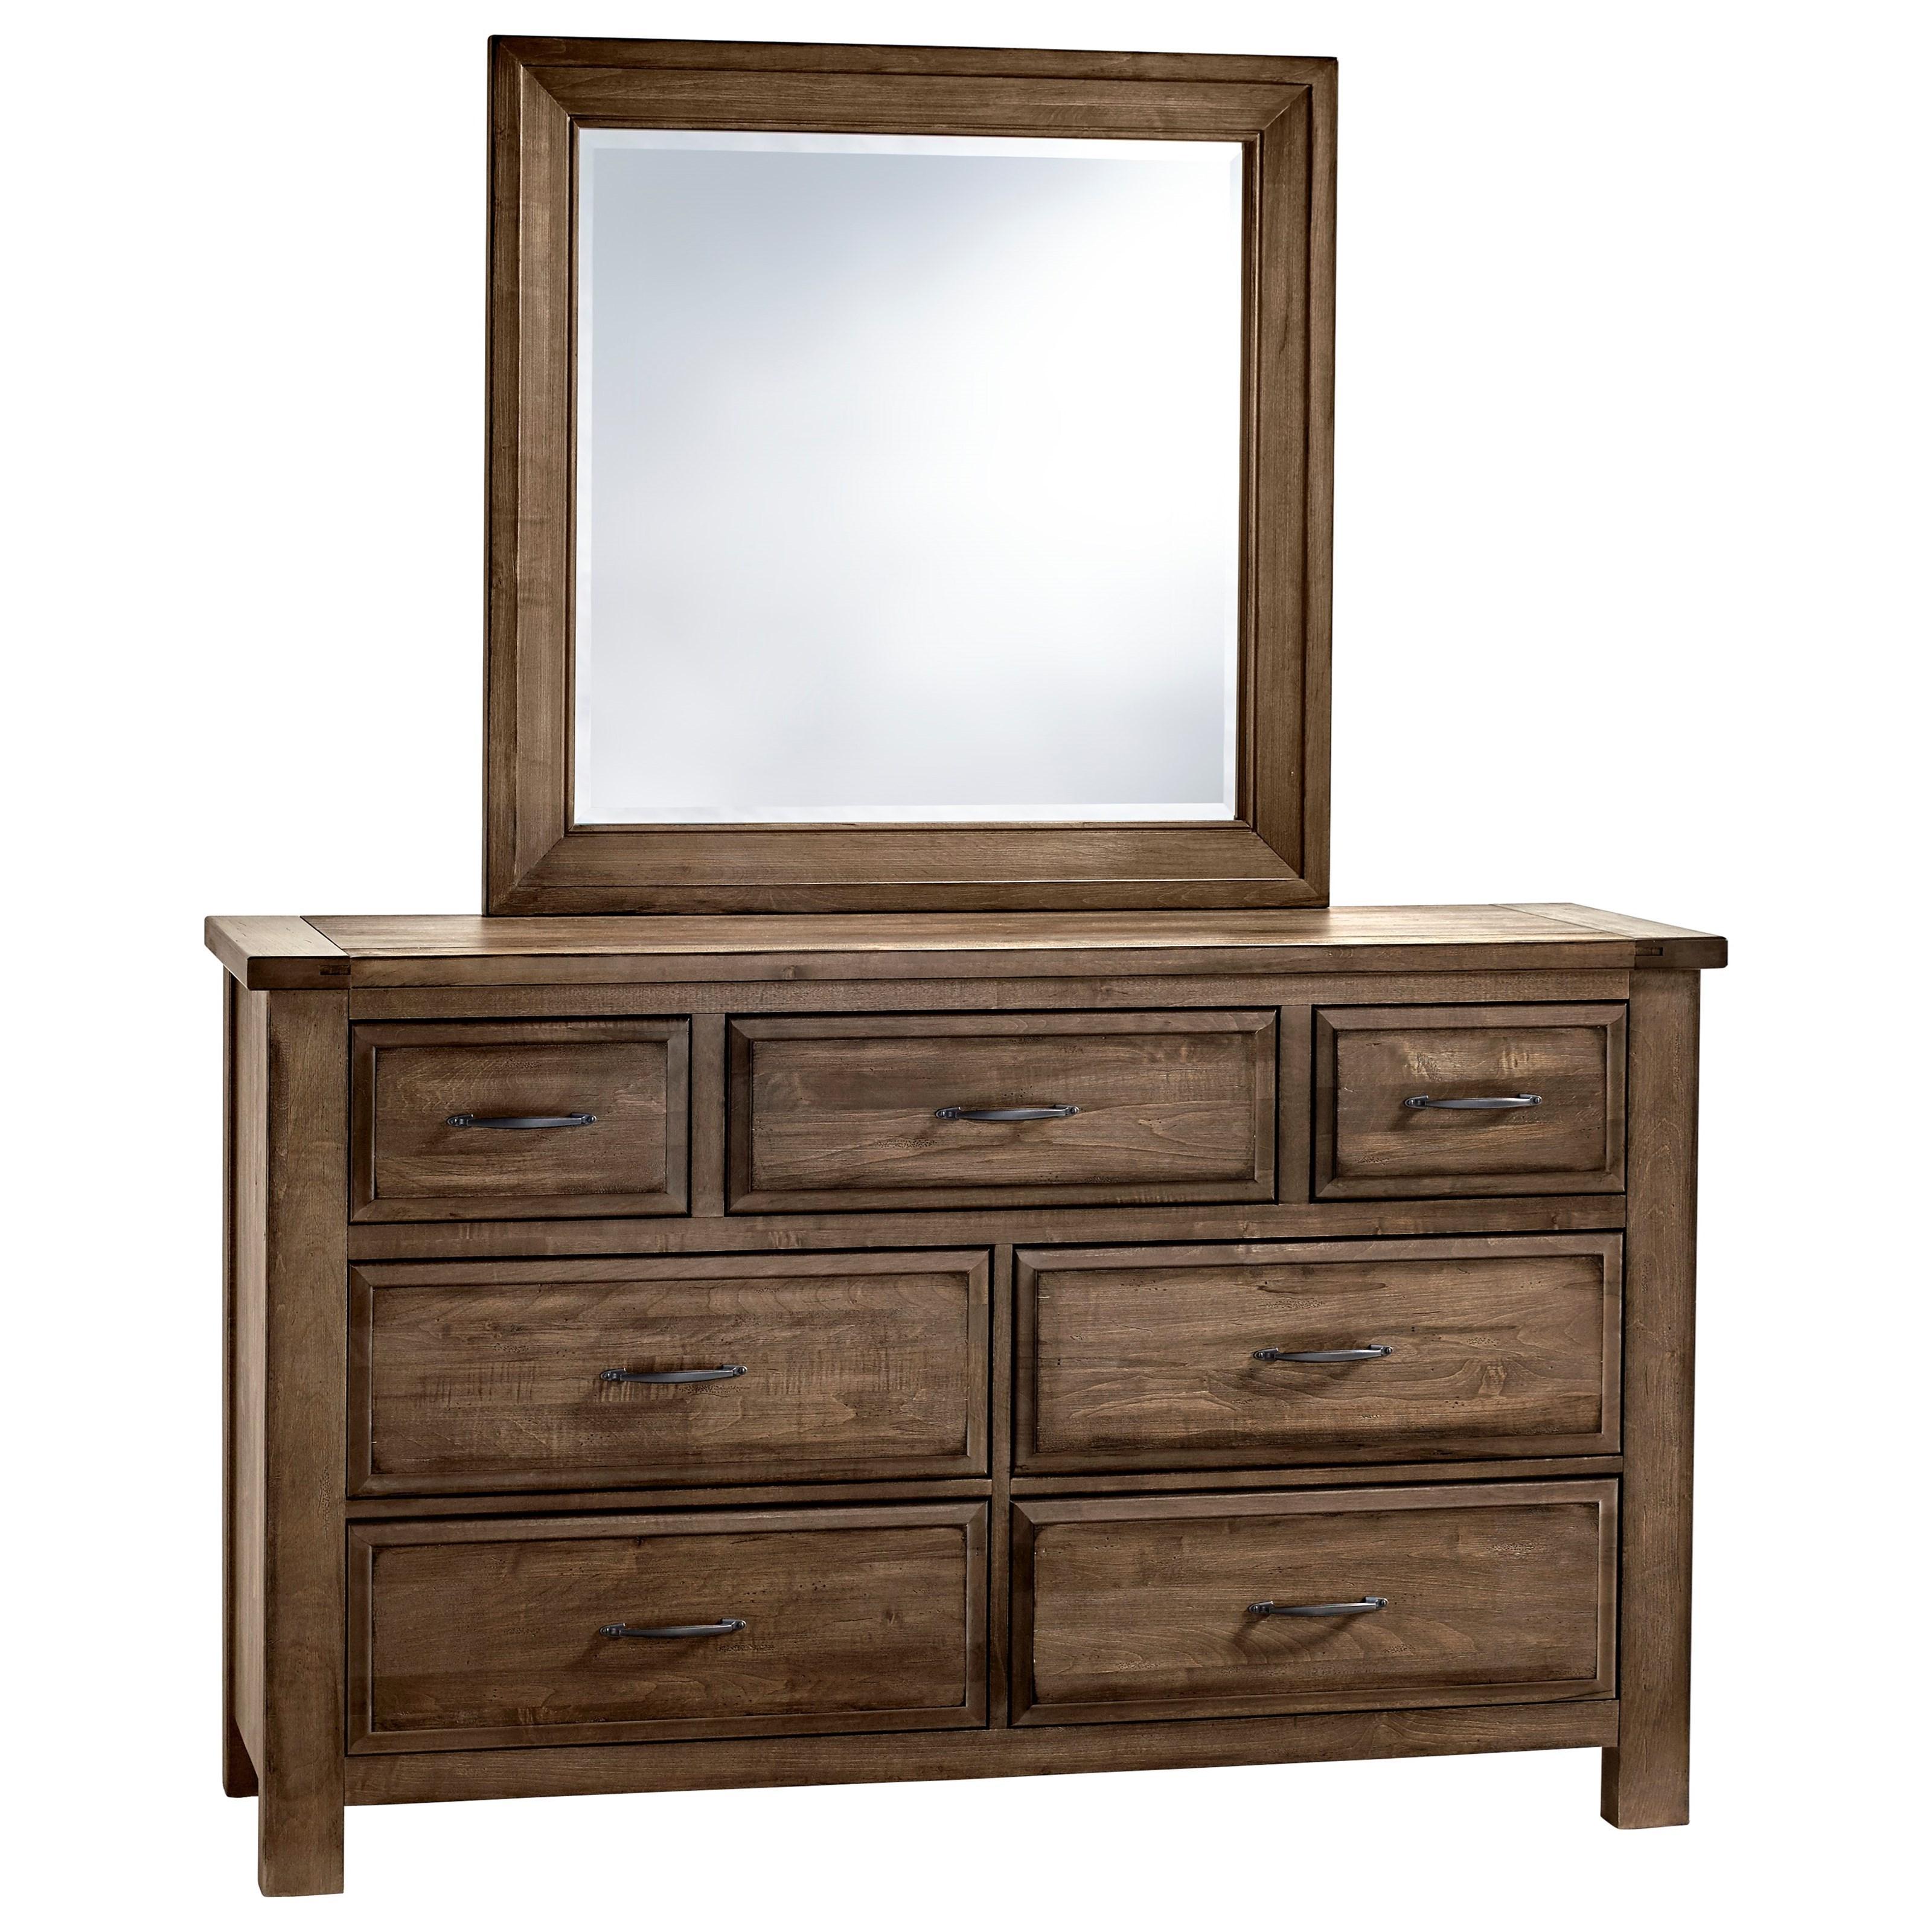 Artisan Amp Post Maple Road Solid Wood Dresser Amp Mirror